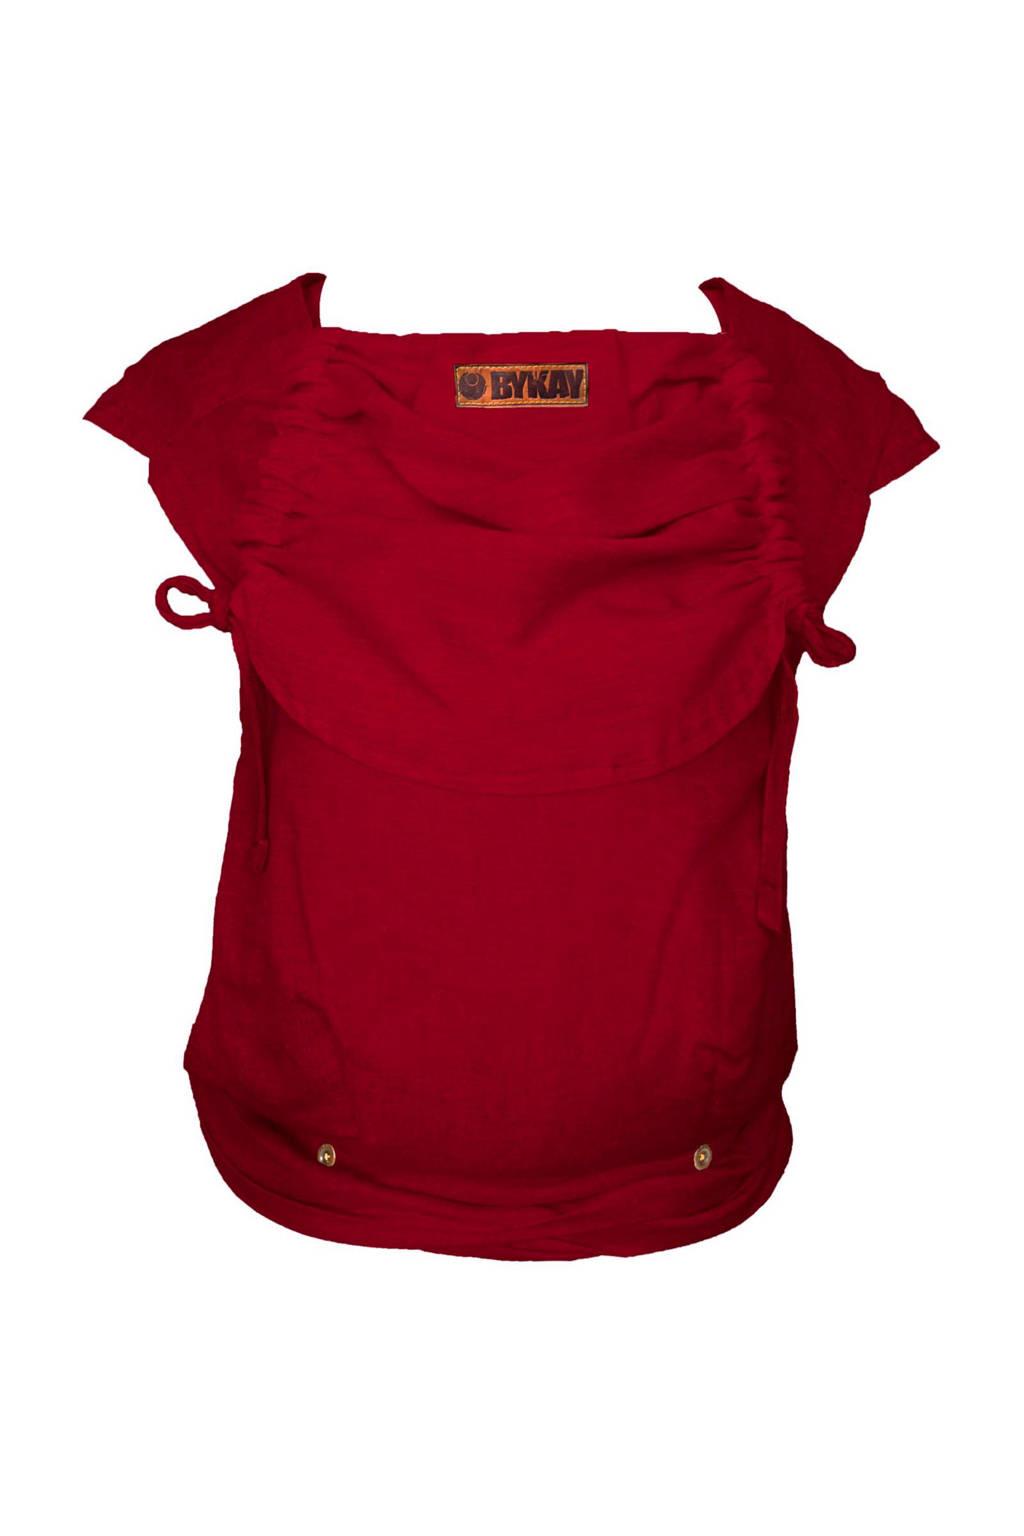 ByKay draagdoek Mei Tai Deluxe 50075 rood, Berry Red